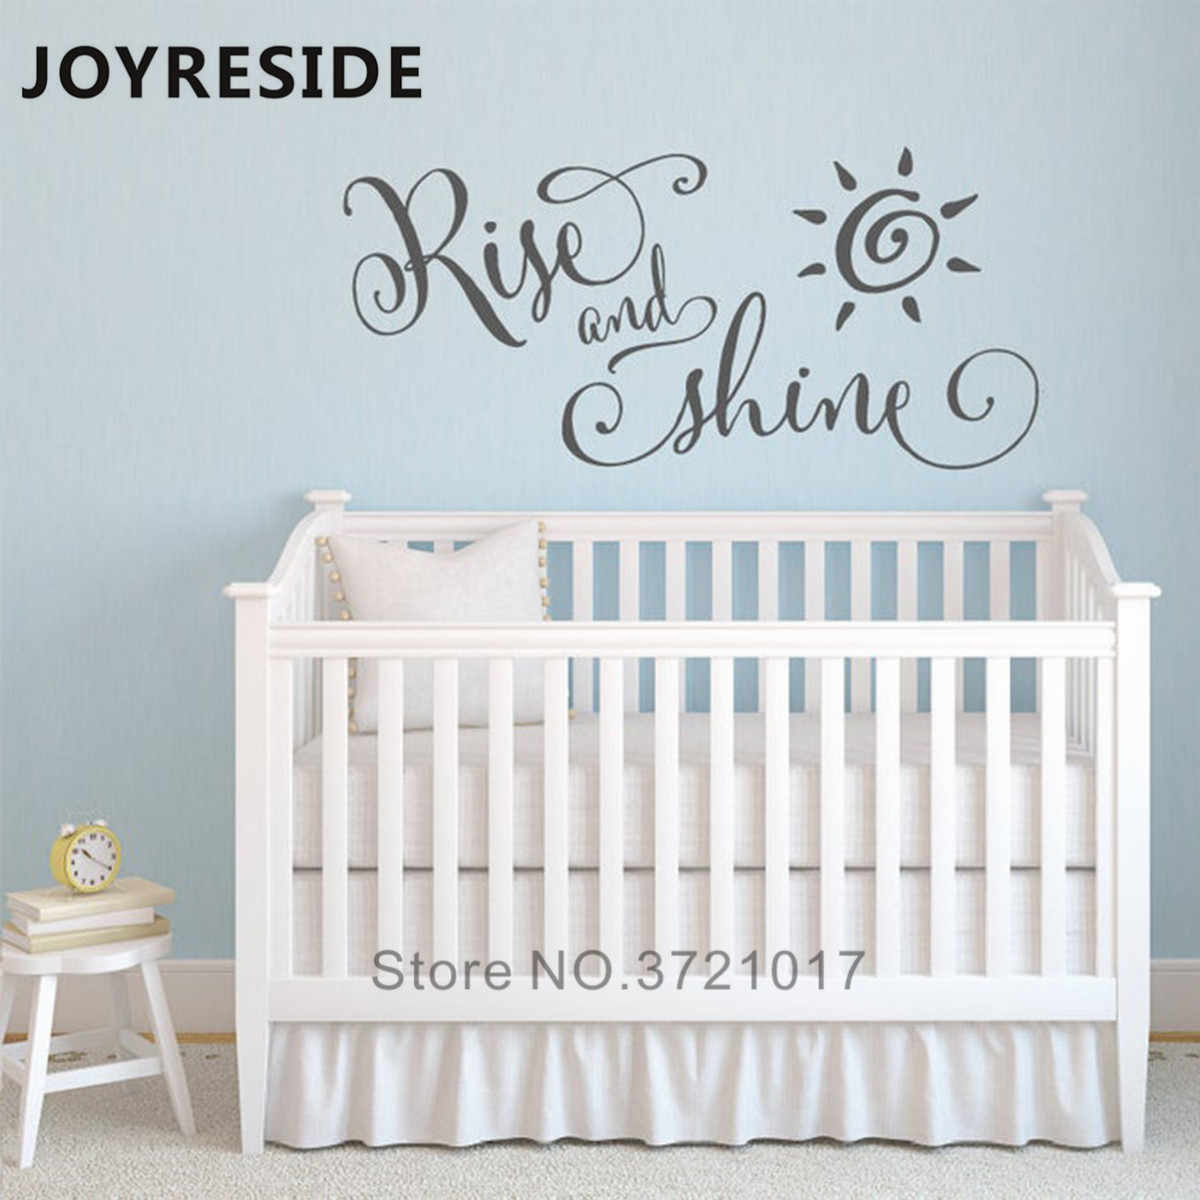 Rise And Shine Cute Wall Sticker Home